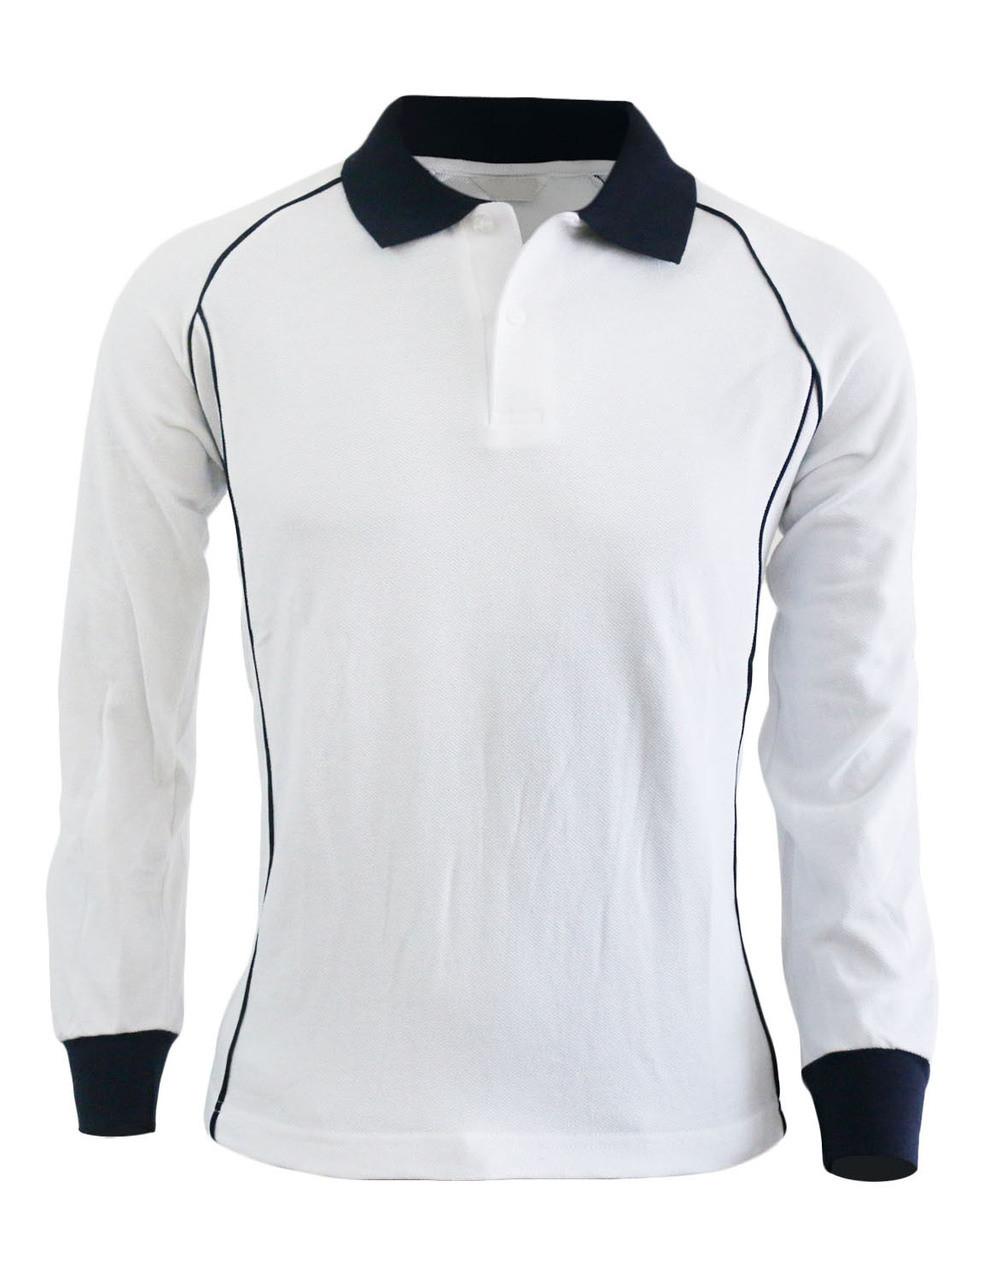 Casual unisex sportswear unique design long sleeve polo shirt